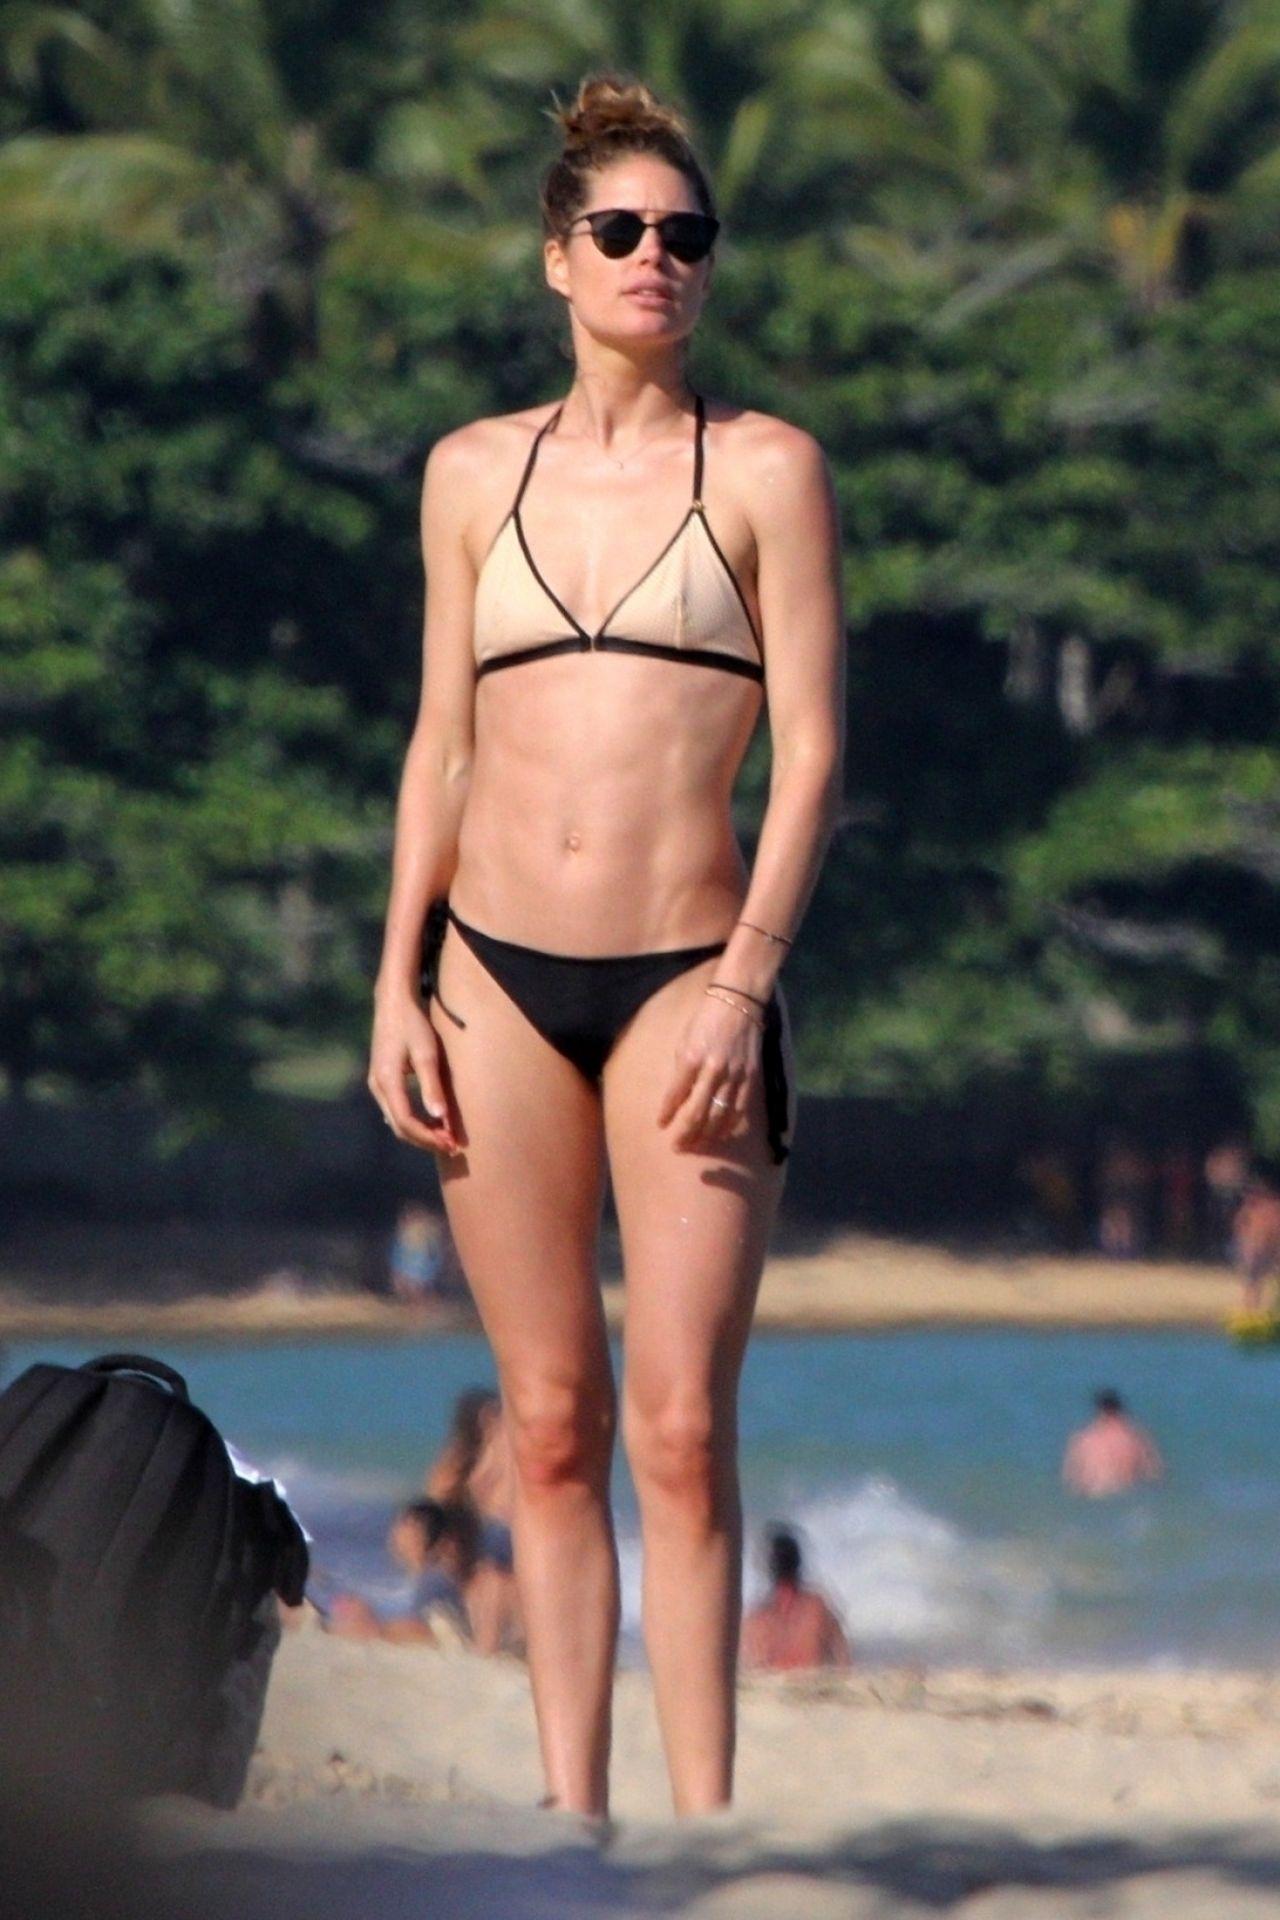 Candice Swanepoel and Doutzen Kroes in Bikini at Espelho Beach in Bahia Pic 7 of 35